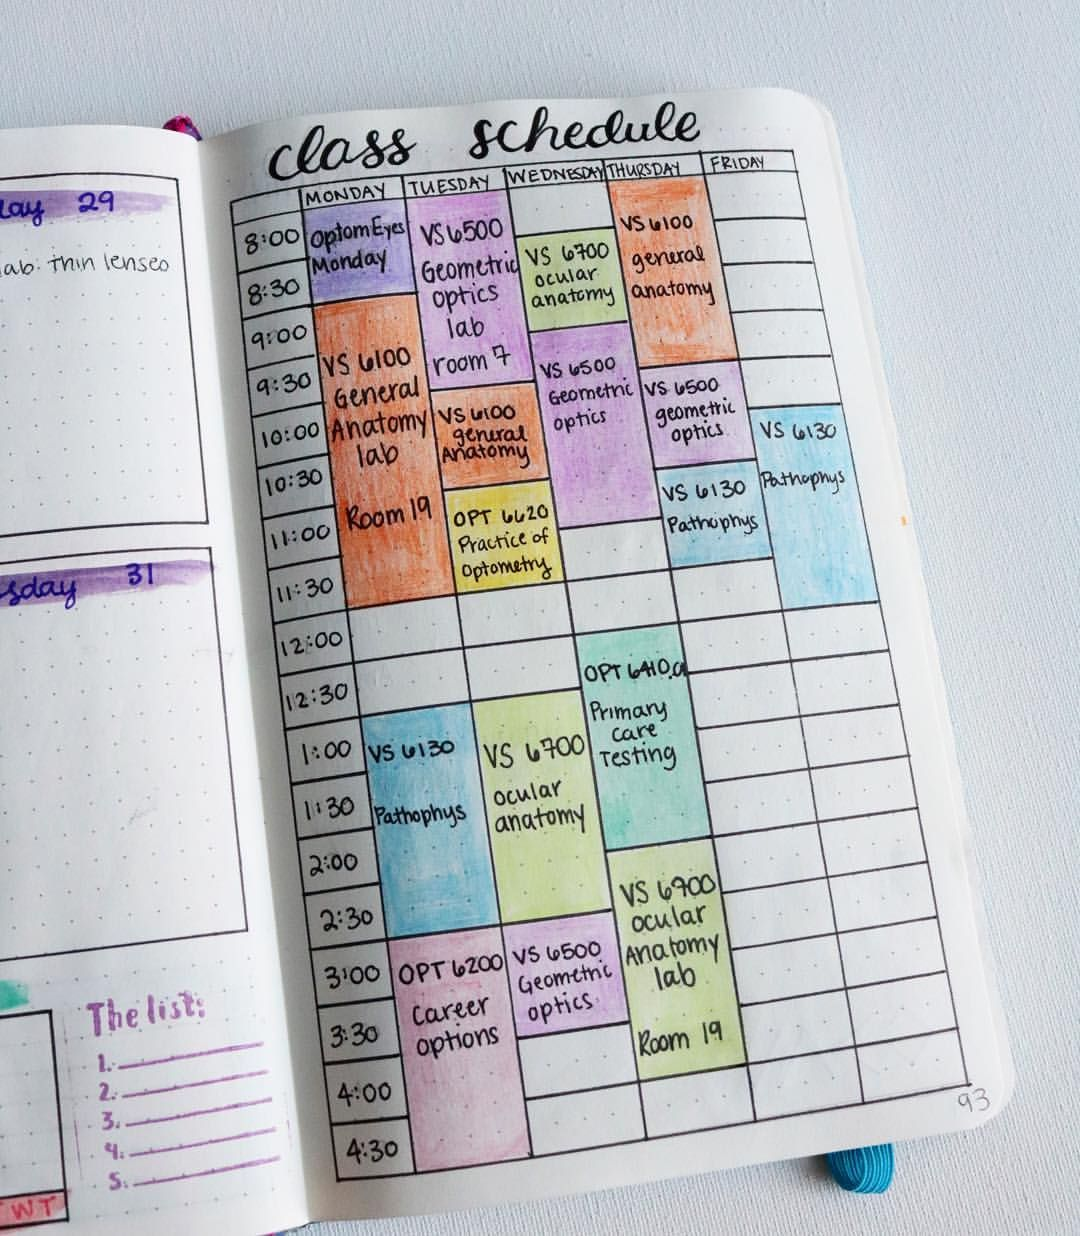 class schedule layout